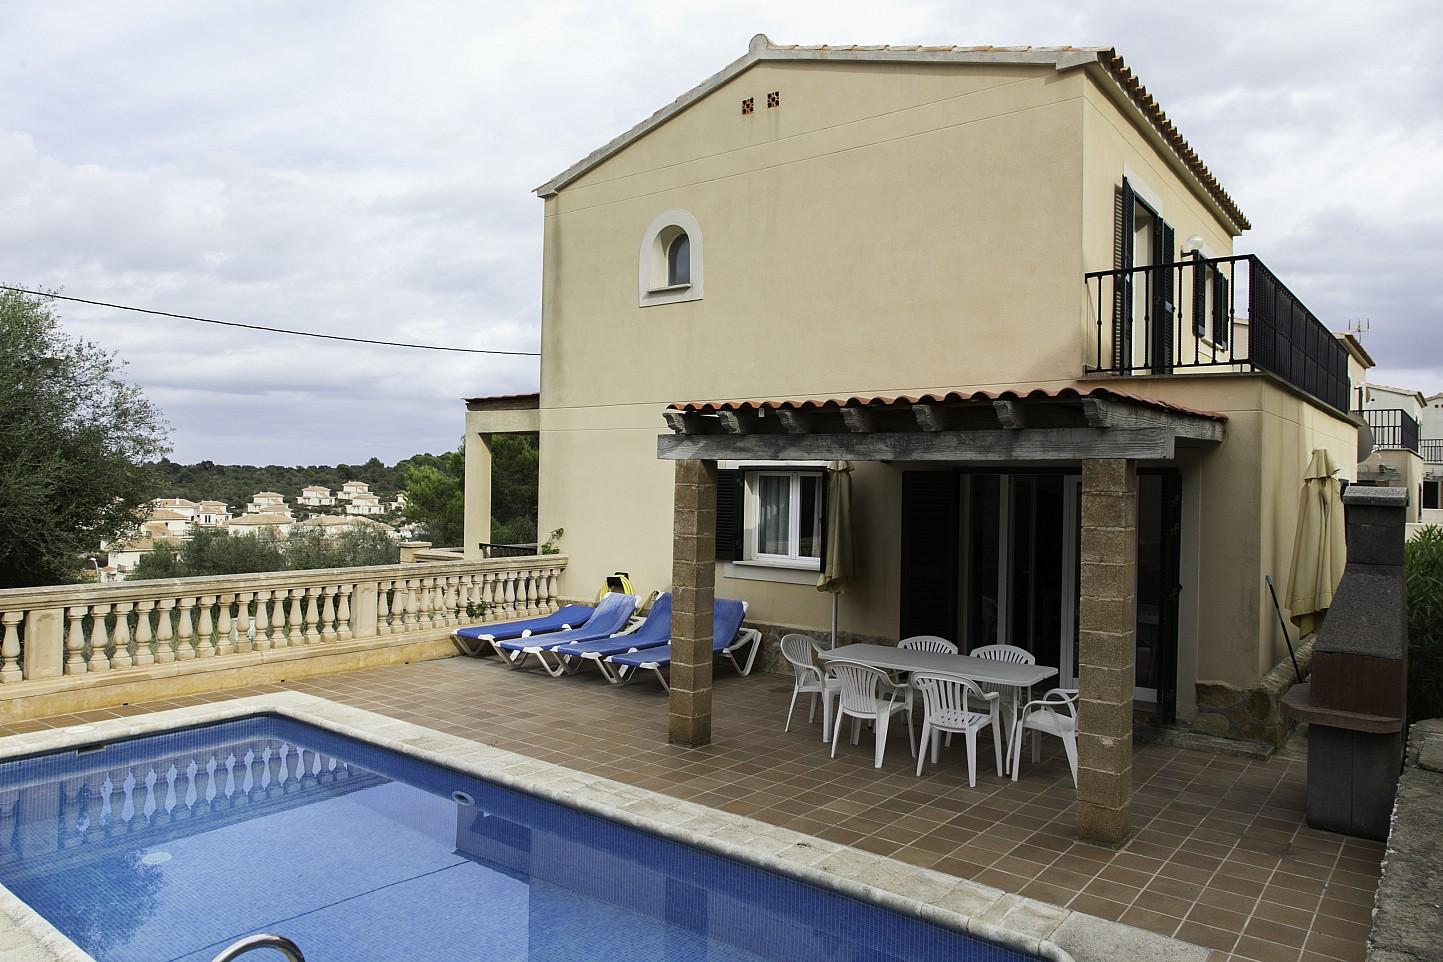 Swimming-Pool und Veranda  eines Hauses zum Verkauf in Villas de Cala Romántica, Mallorca